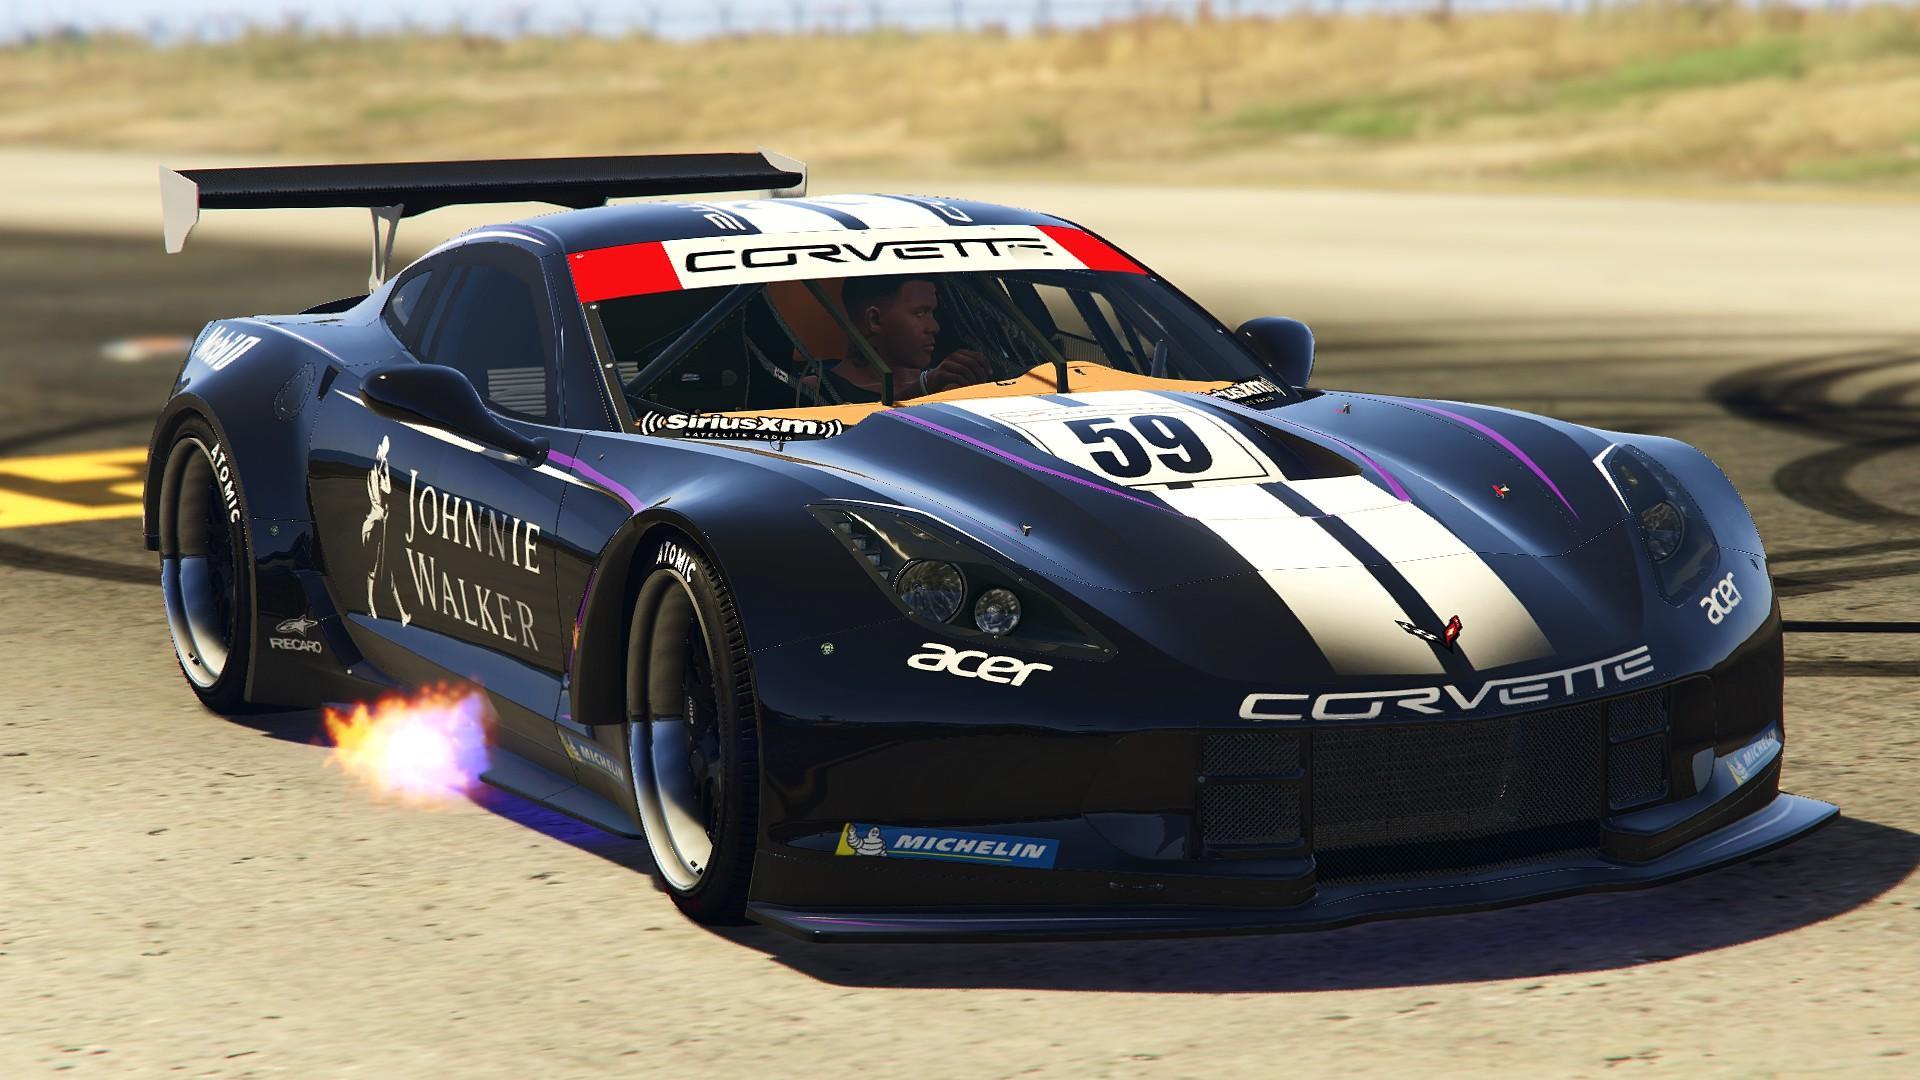 Chevrolet Corvette C7R [Add-On][Reworked] - GTA5-Mods.com